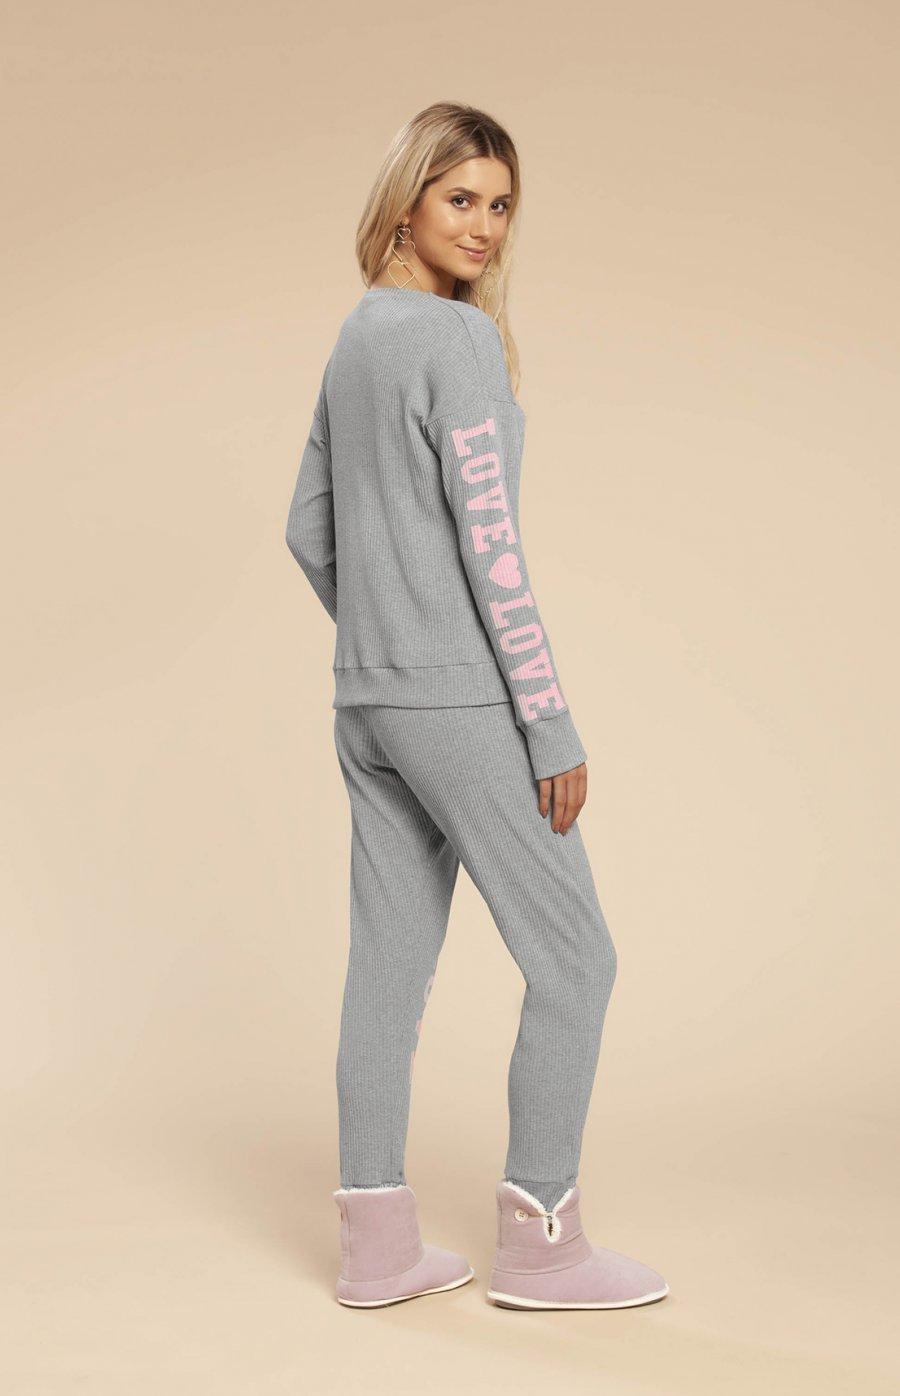 Pijama Ribana Love Yourself Inverno 2019 CLOUD CLUB